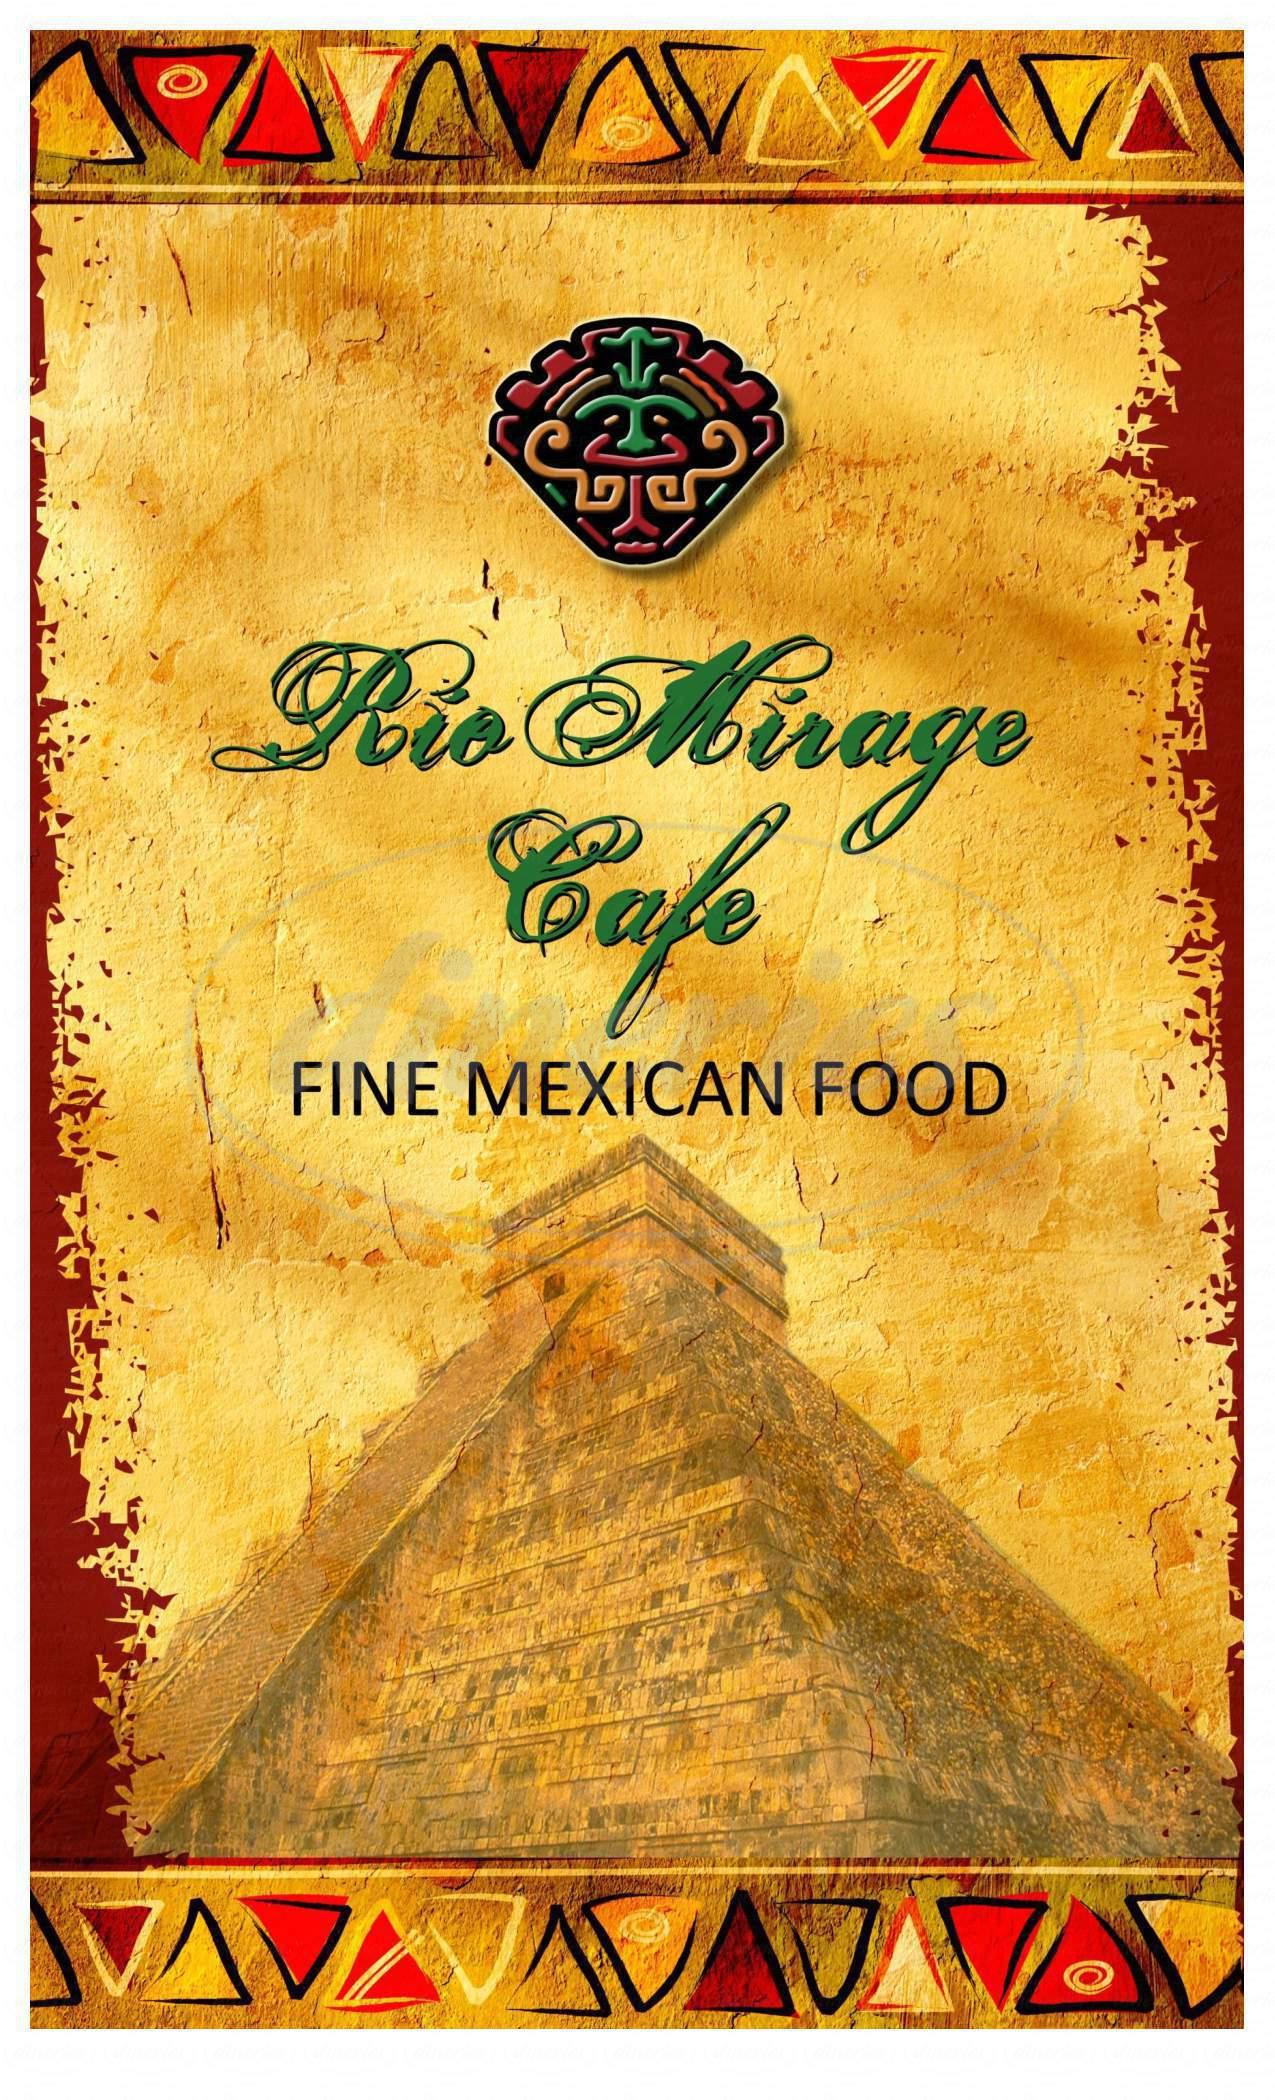 menu for Rio Mirage Cafe